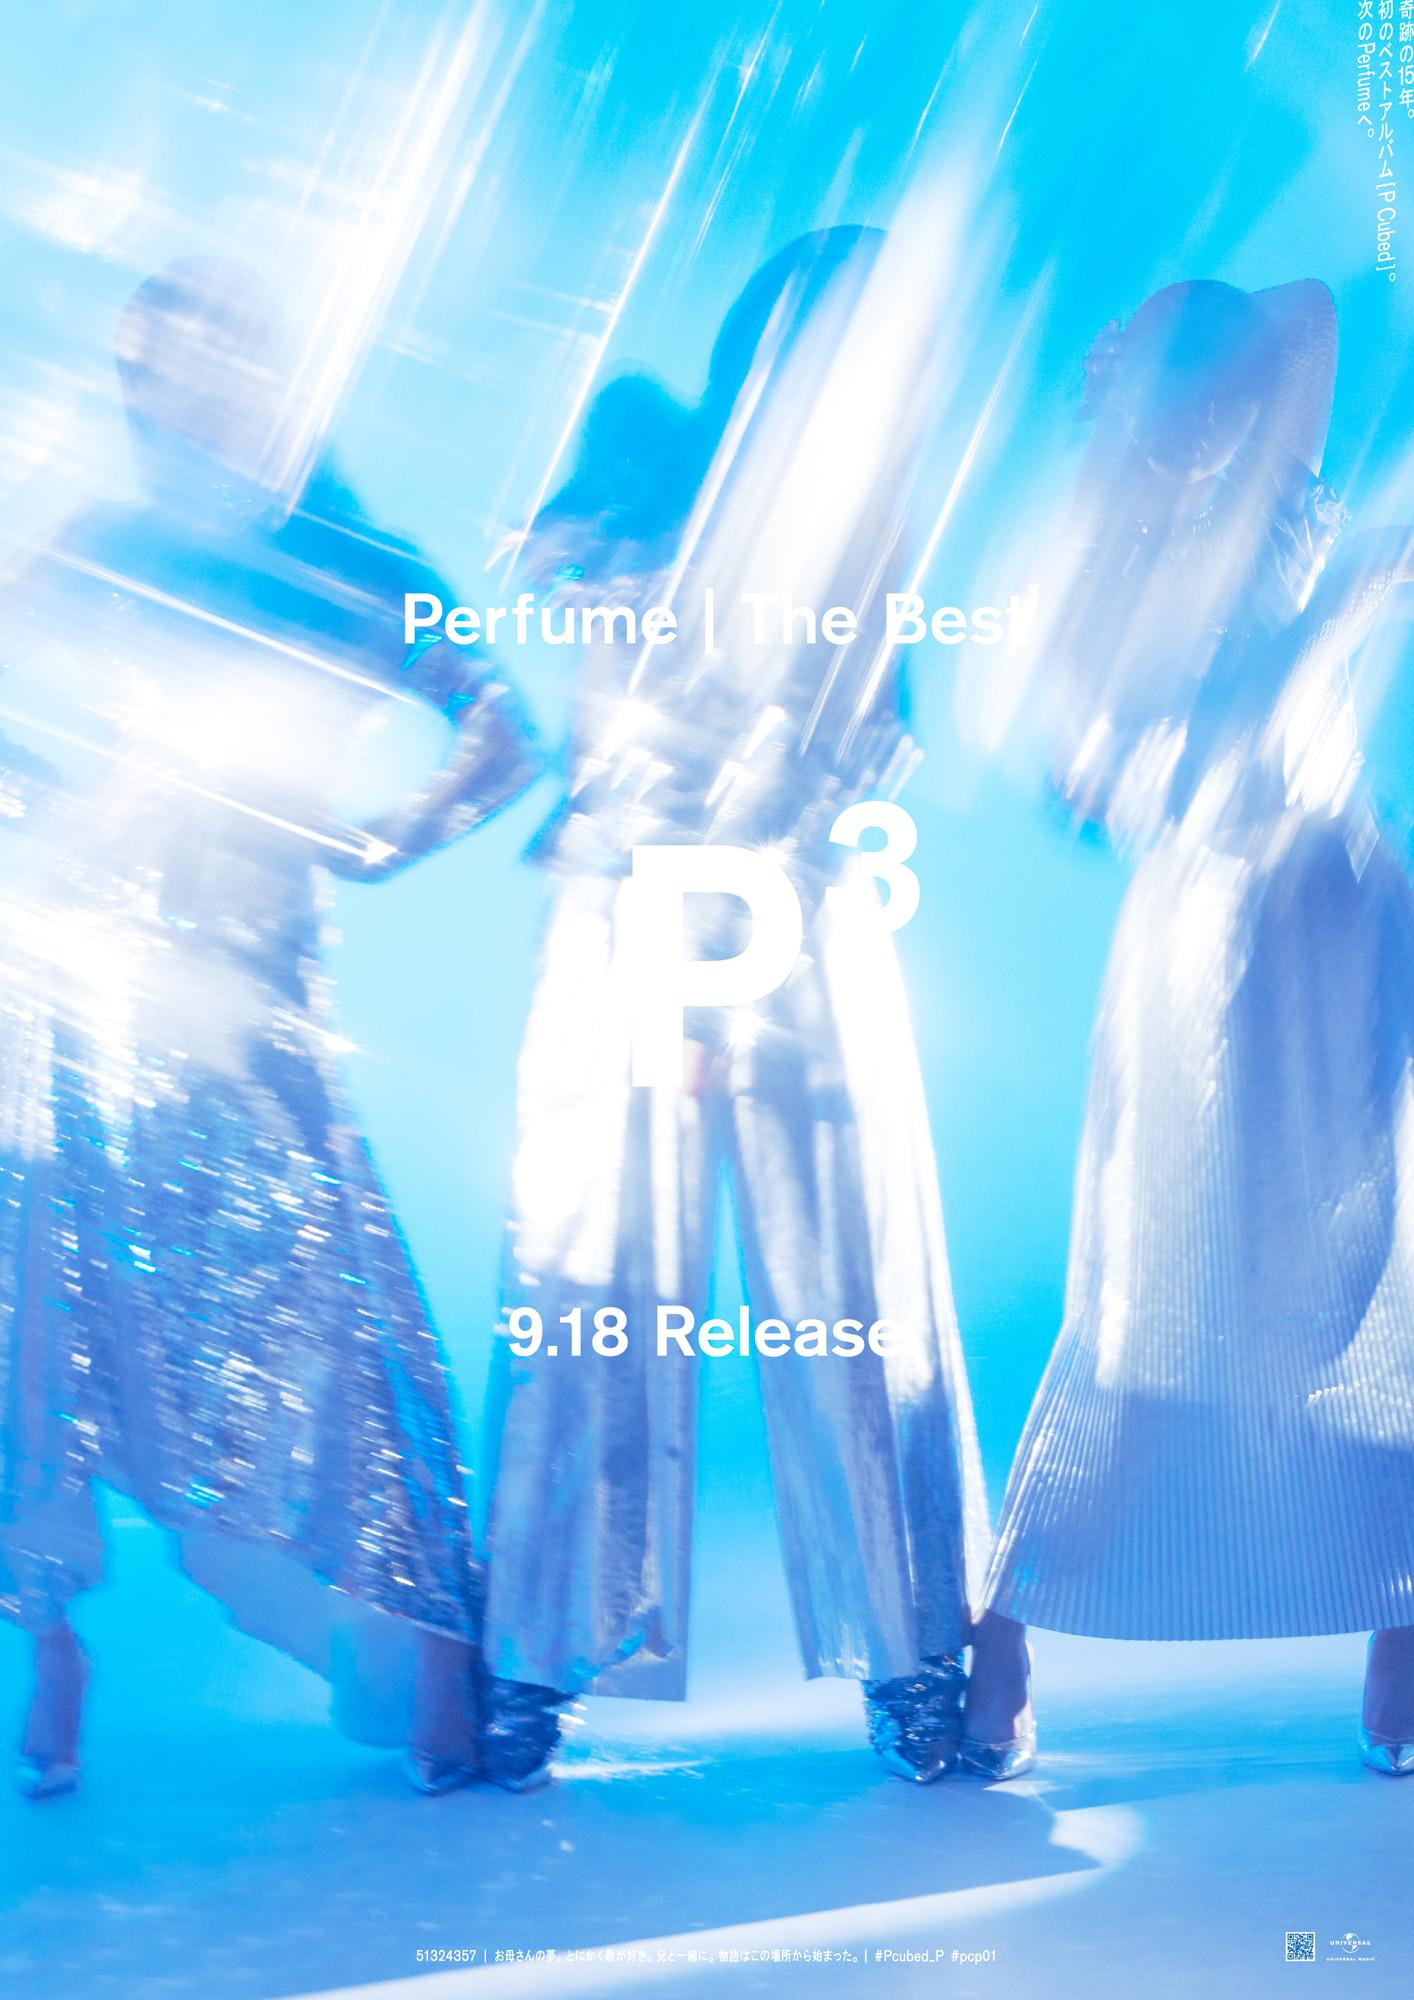 perfume_poster_1.jpg